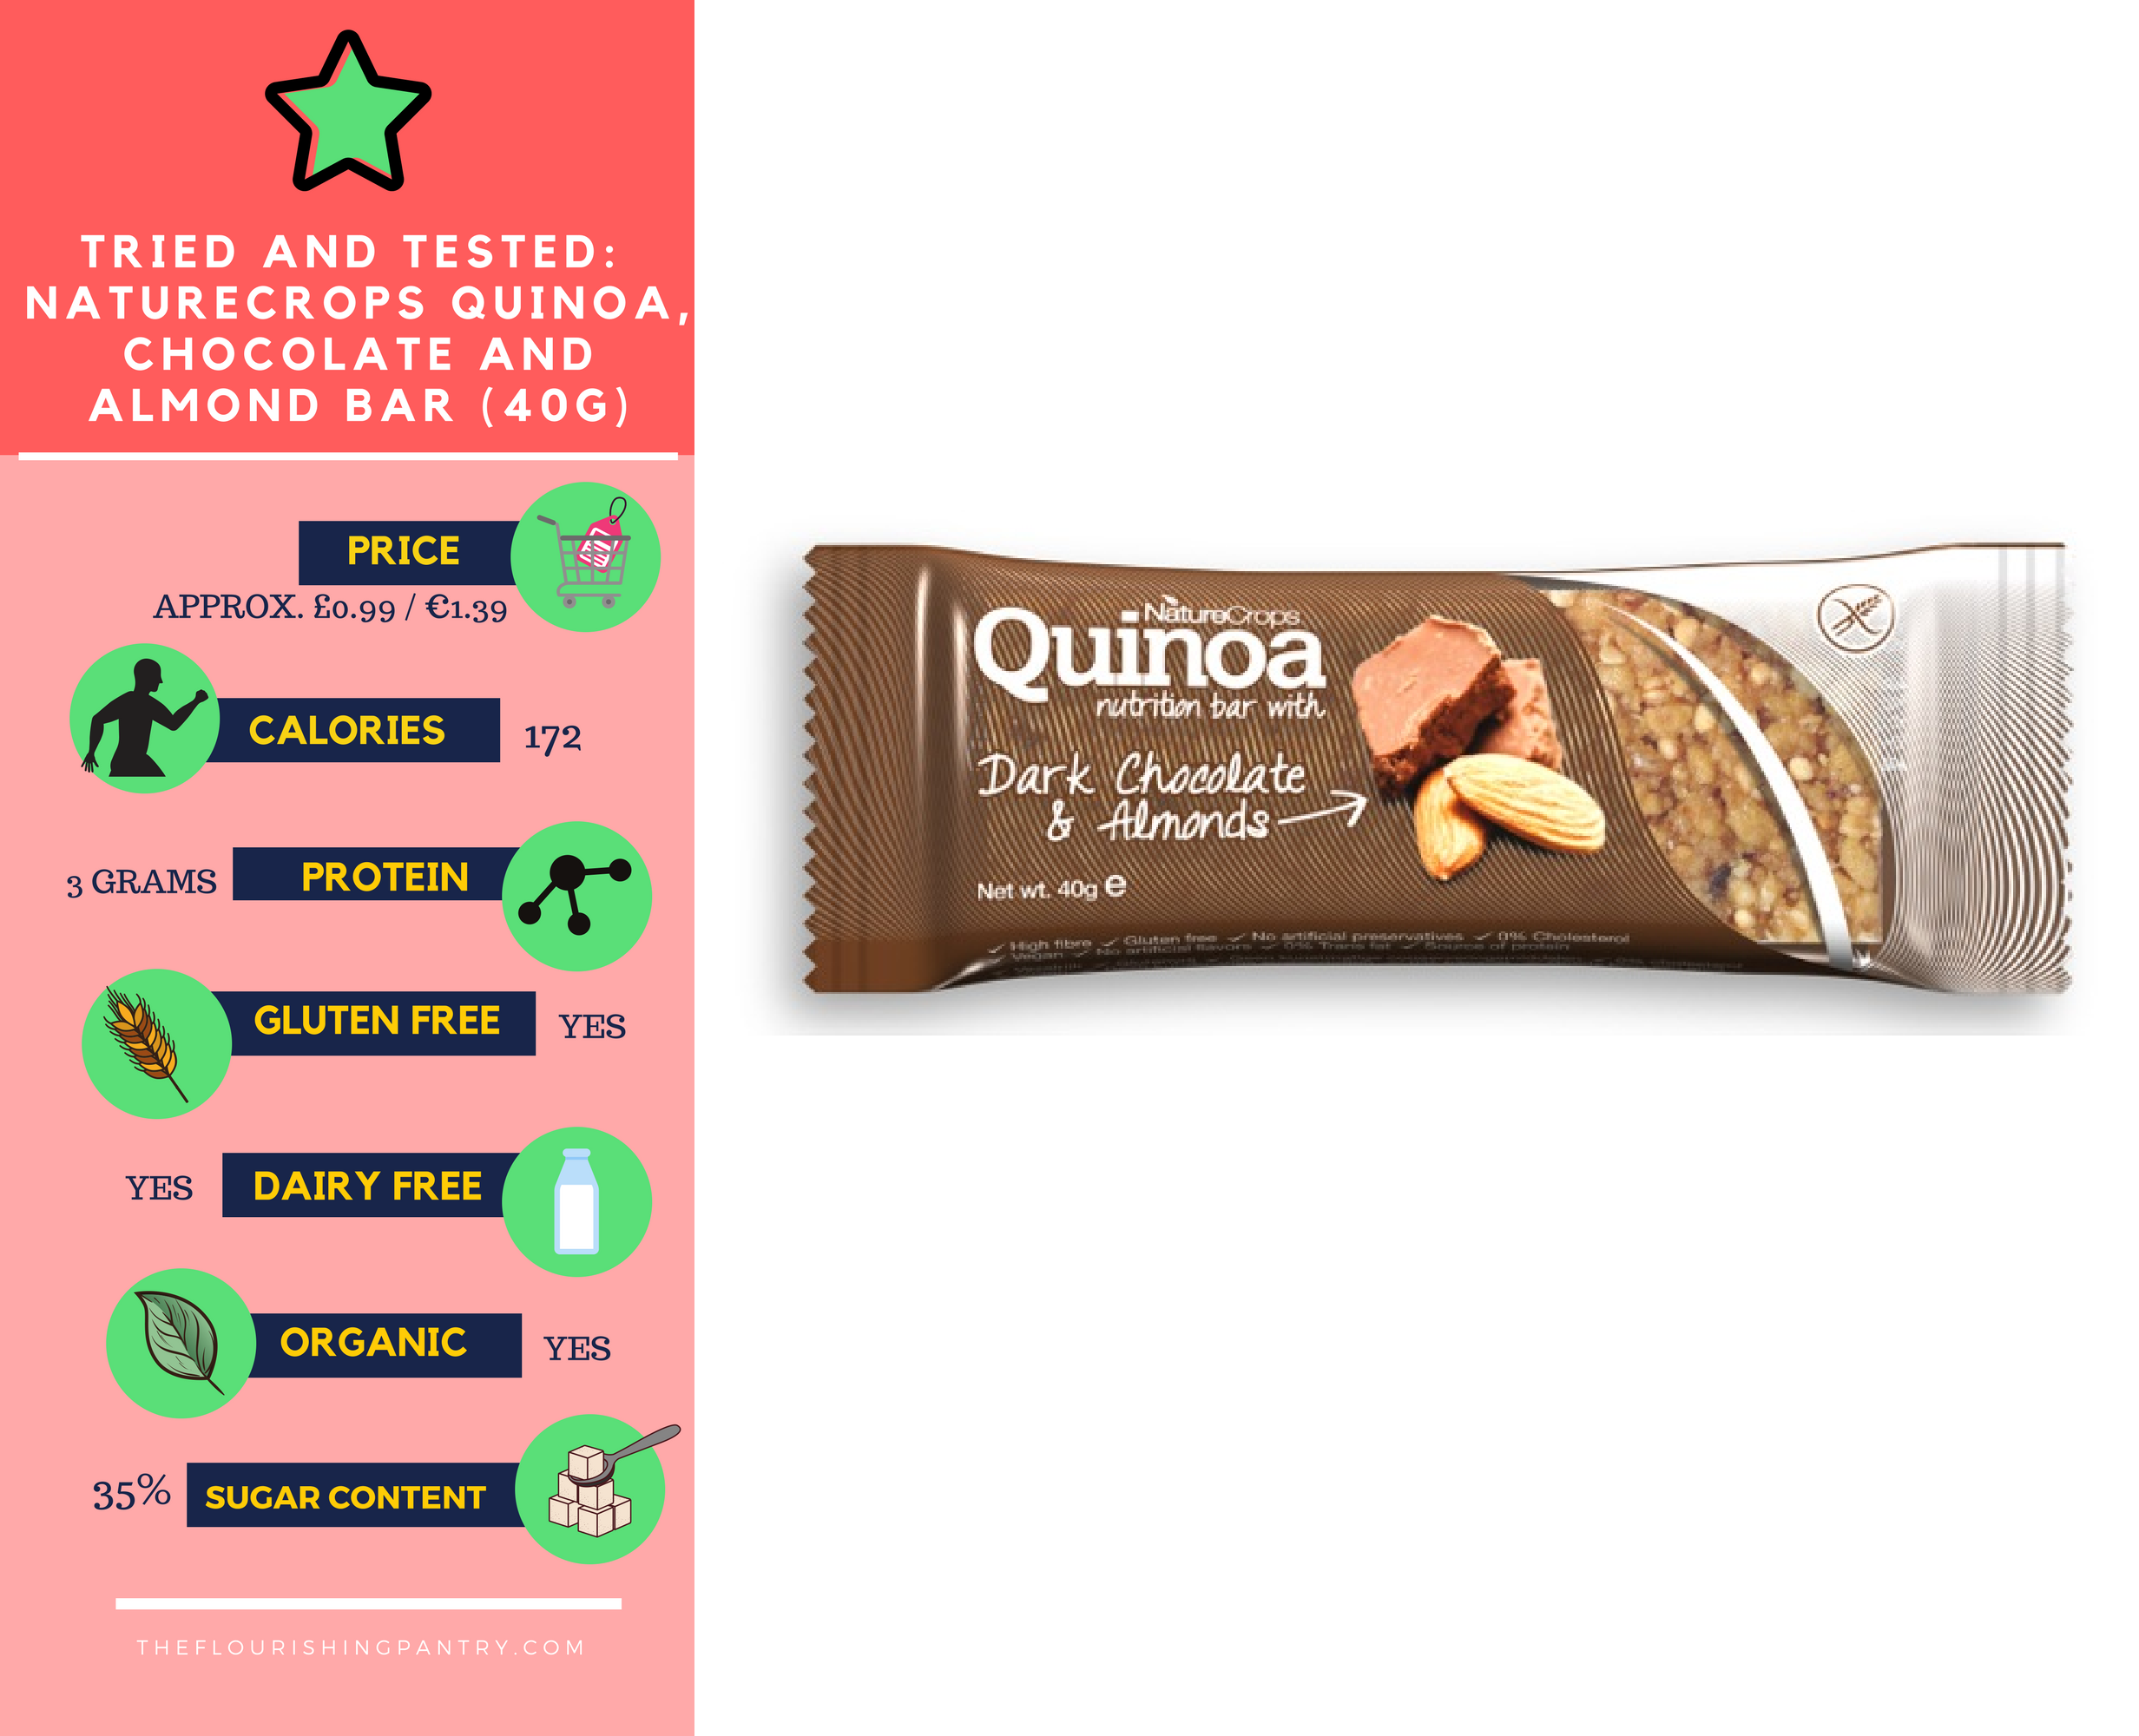 NatureCrops quinoa bar review | The Flourishing Pantry